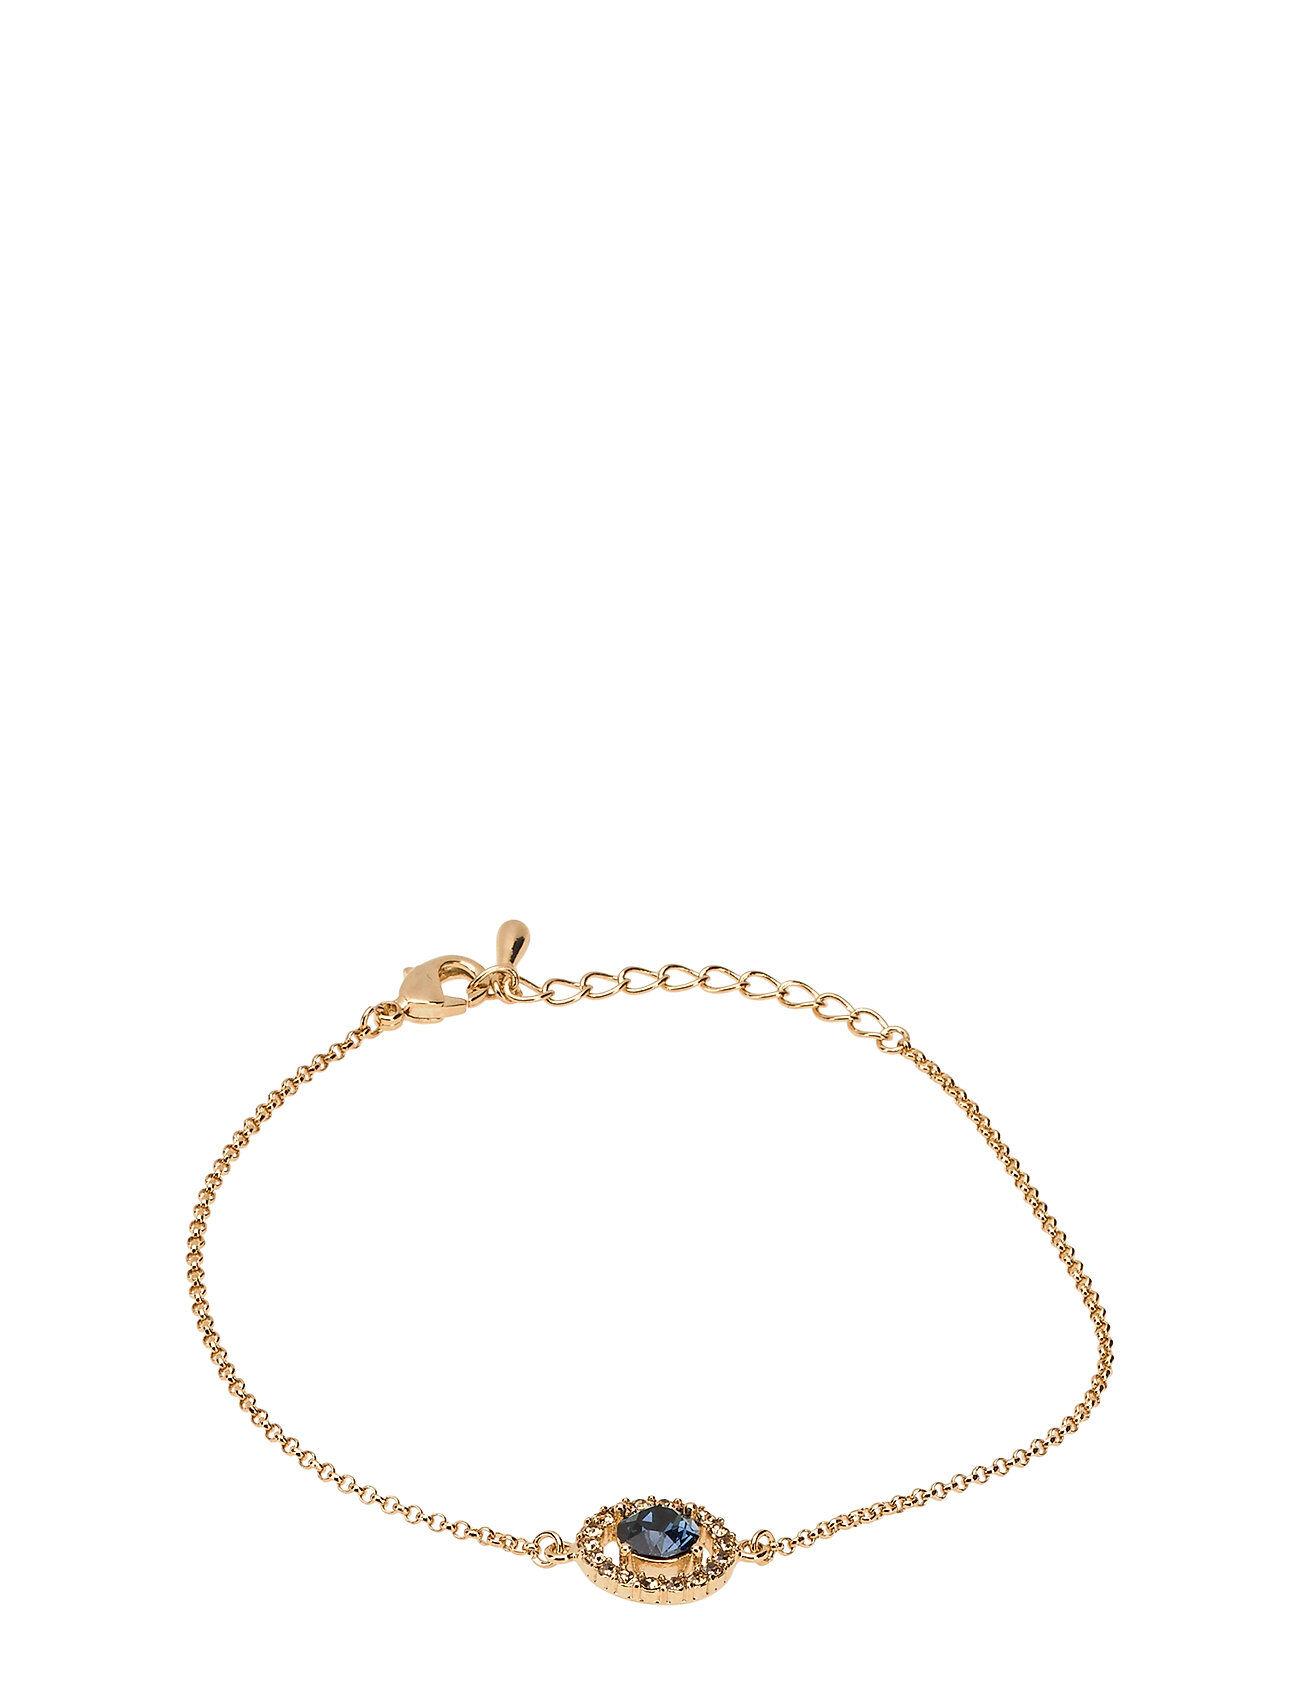 LILY AND ROSE Miss Miranda Bracelet - Golden Blue Accessories Jewellery Bracelets Chain Bracelets Kulta LILY AND ROSE